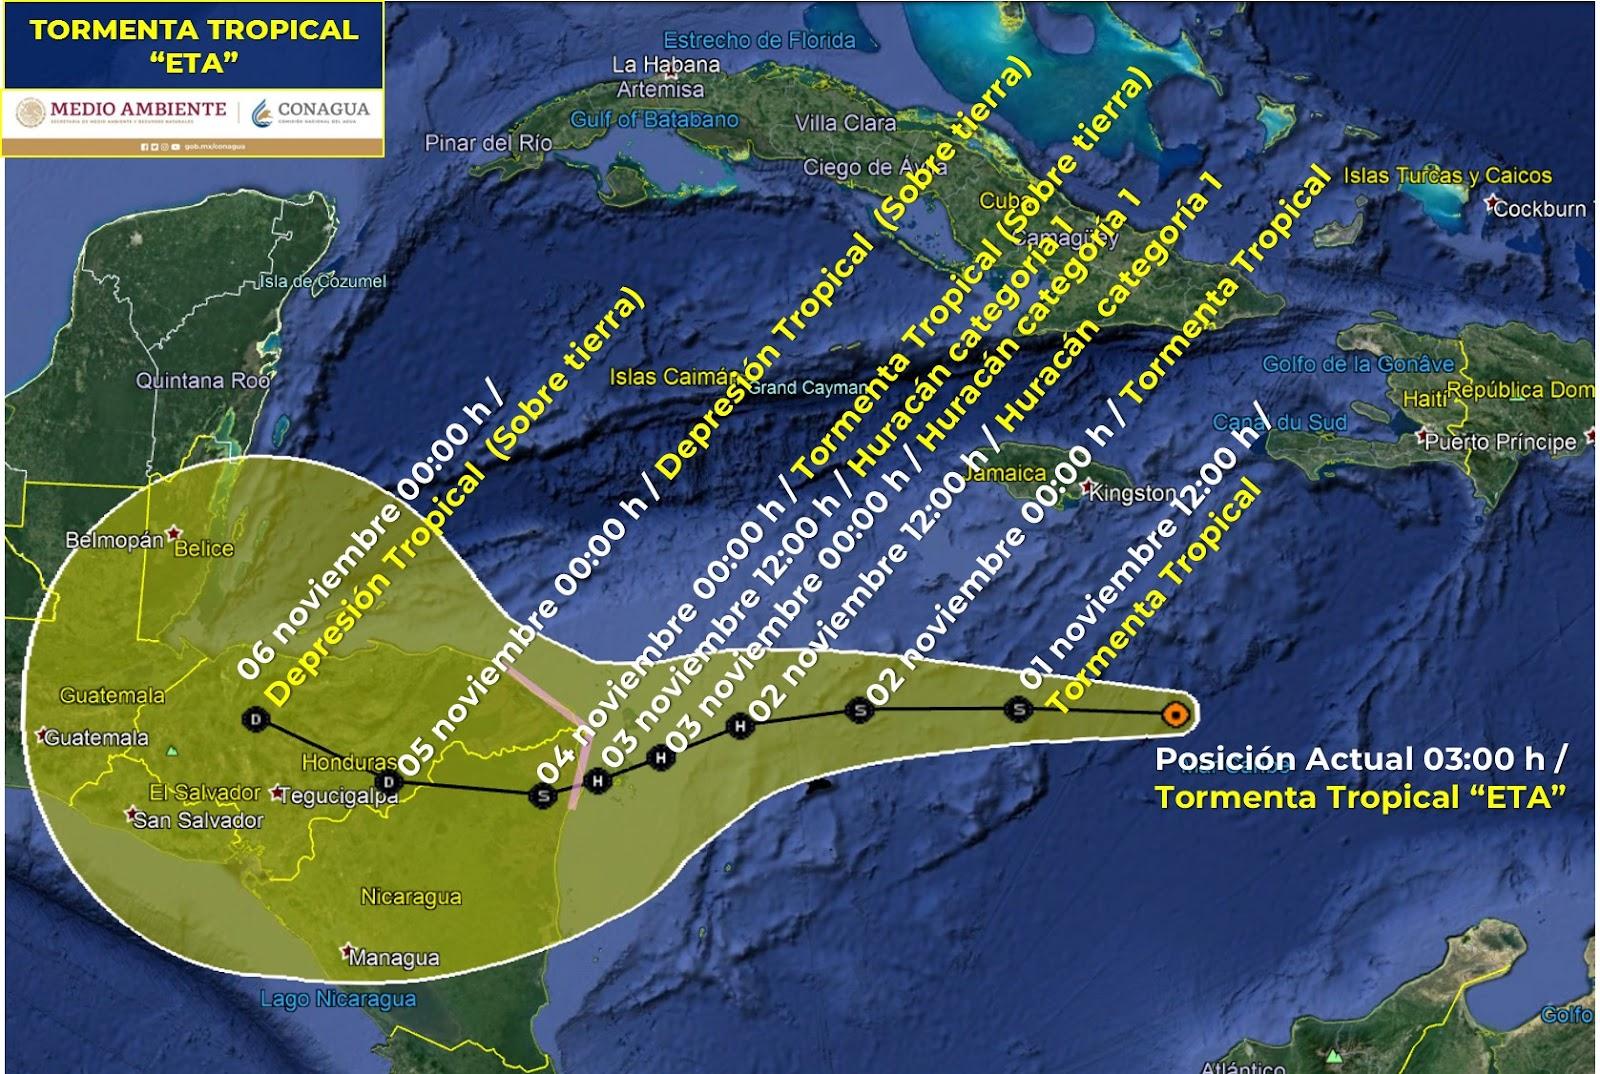 Mapa tormenta Tropical ETA